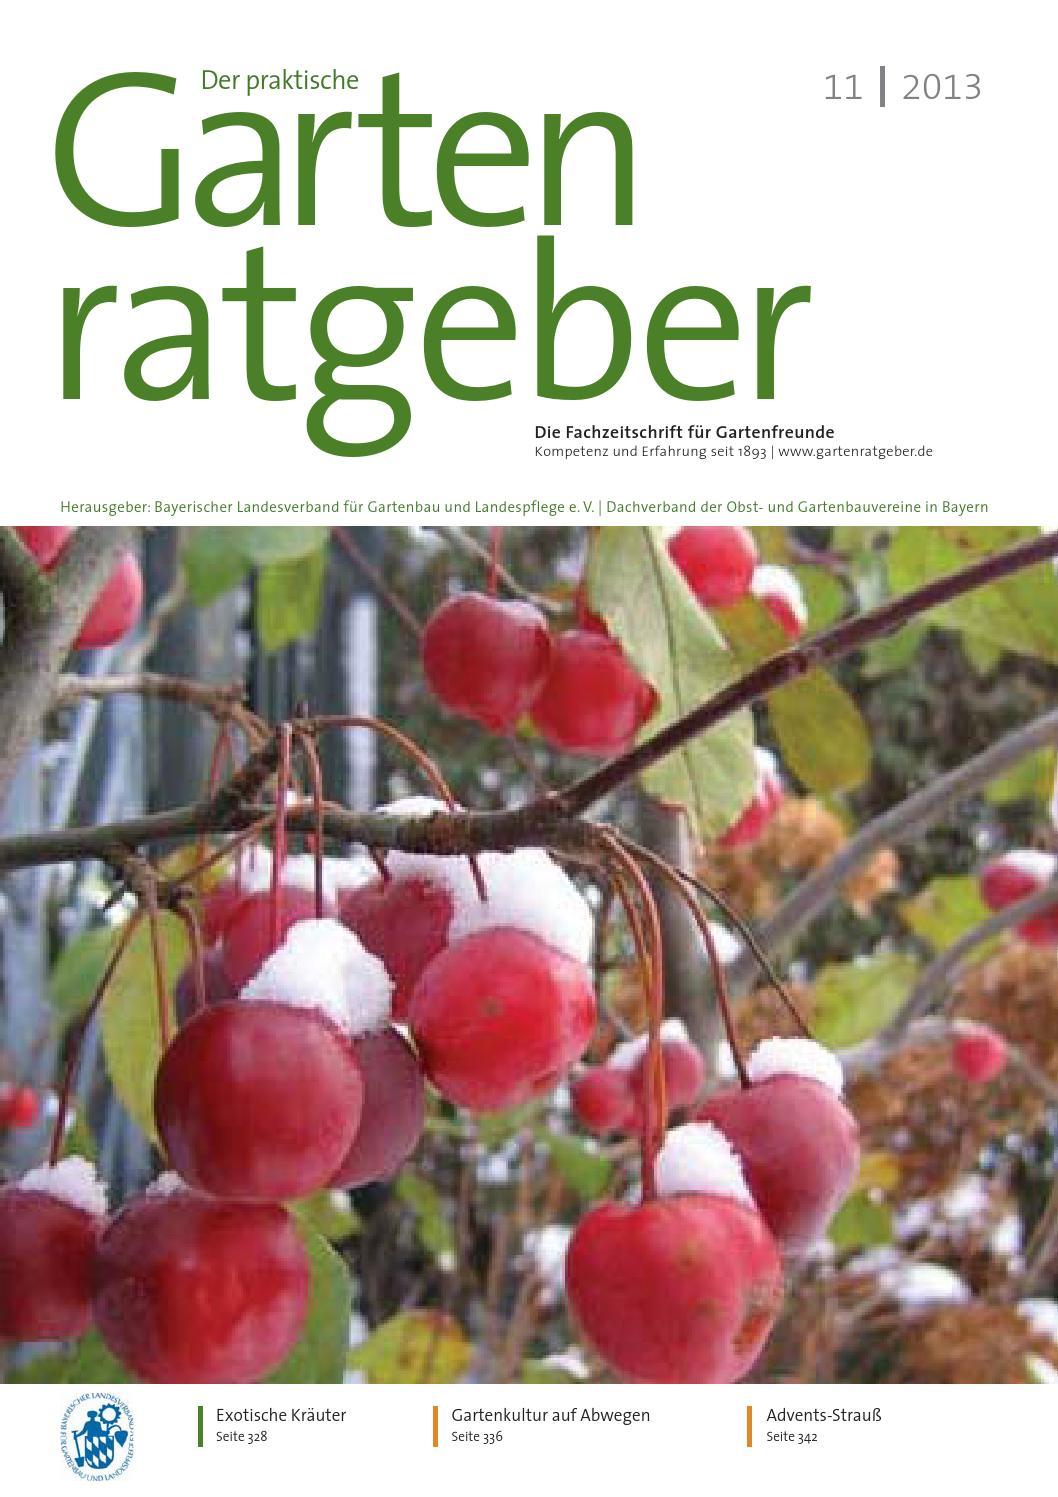 Gartenratgeber 11 2013 by gartenratgeber - issuu